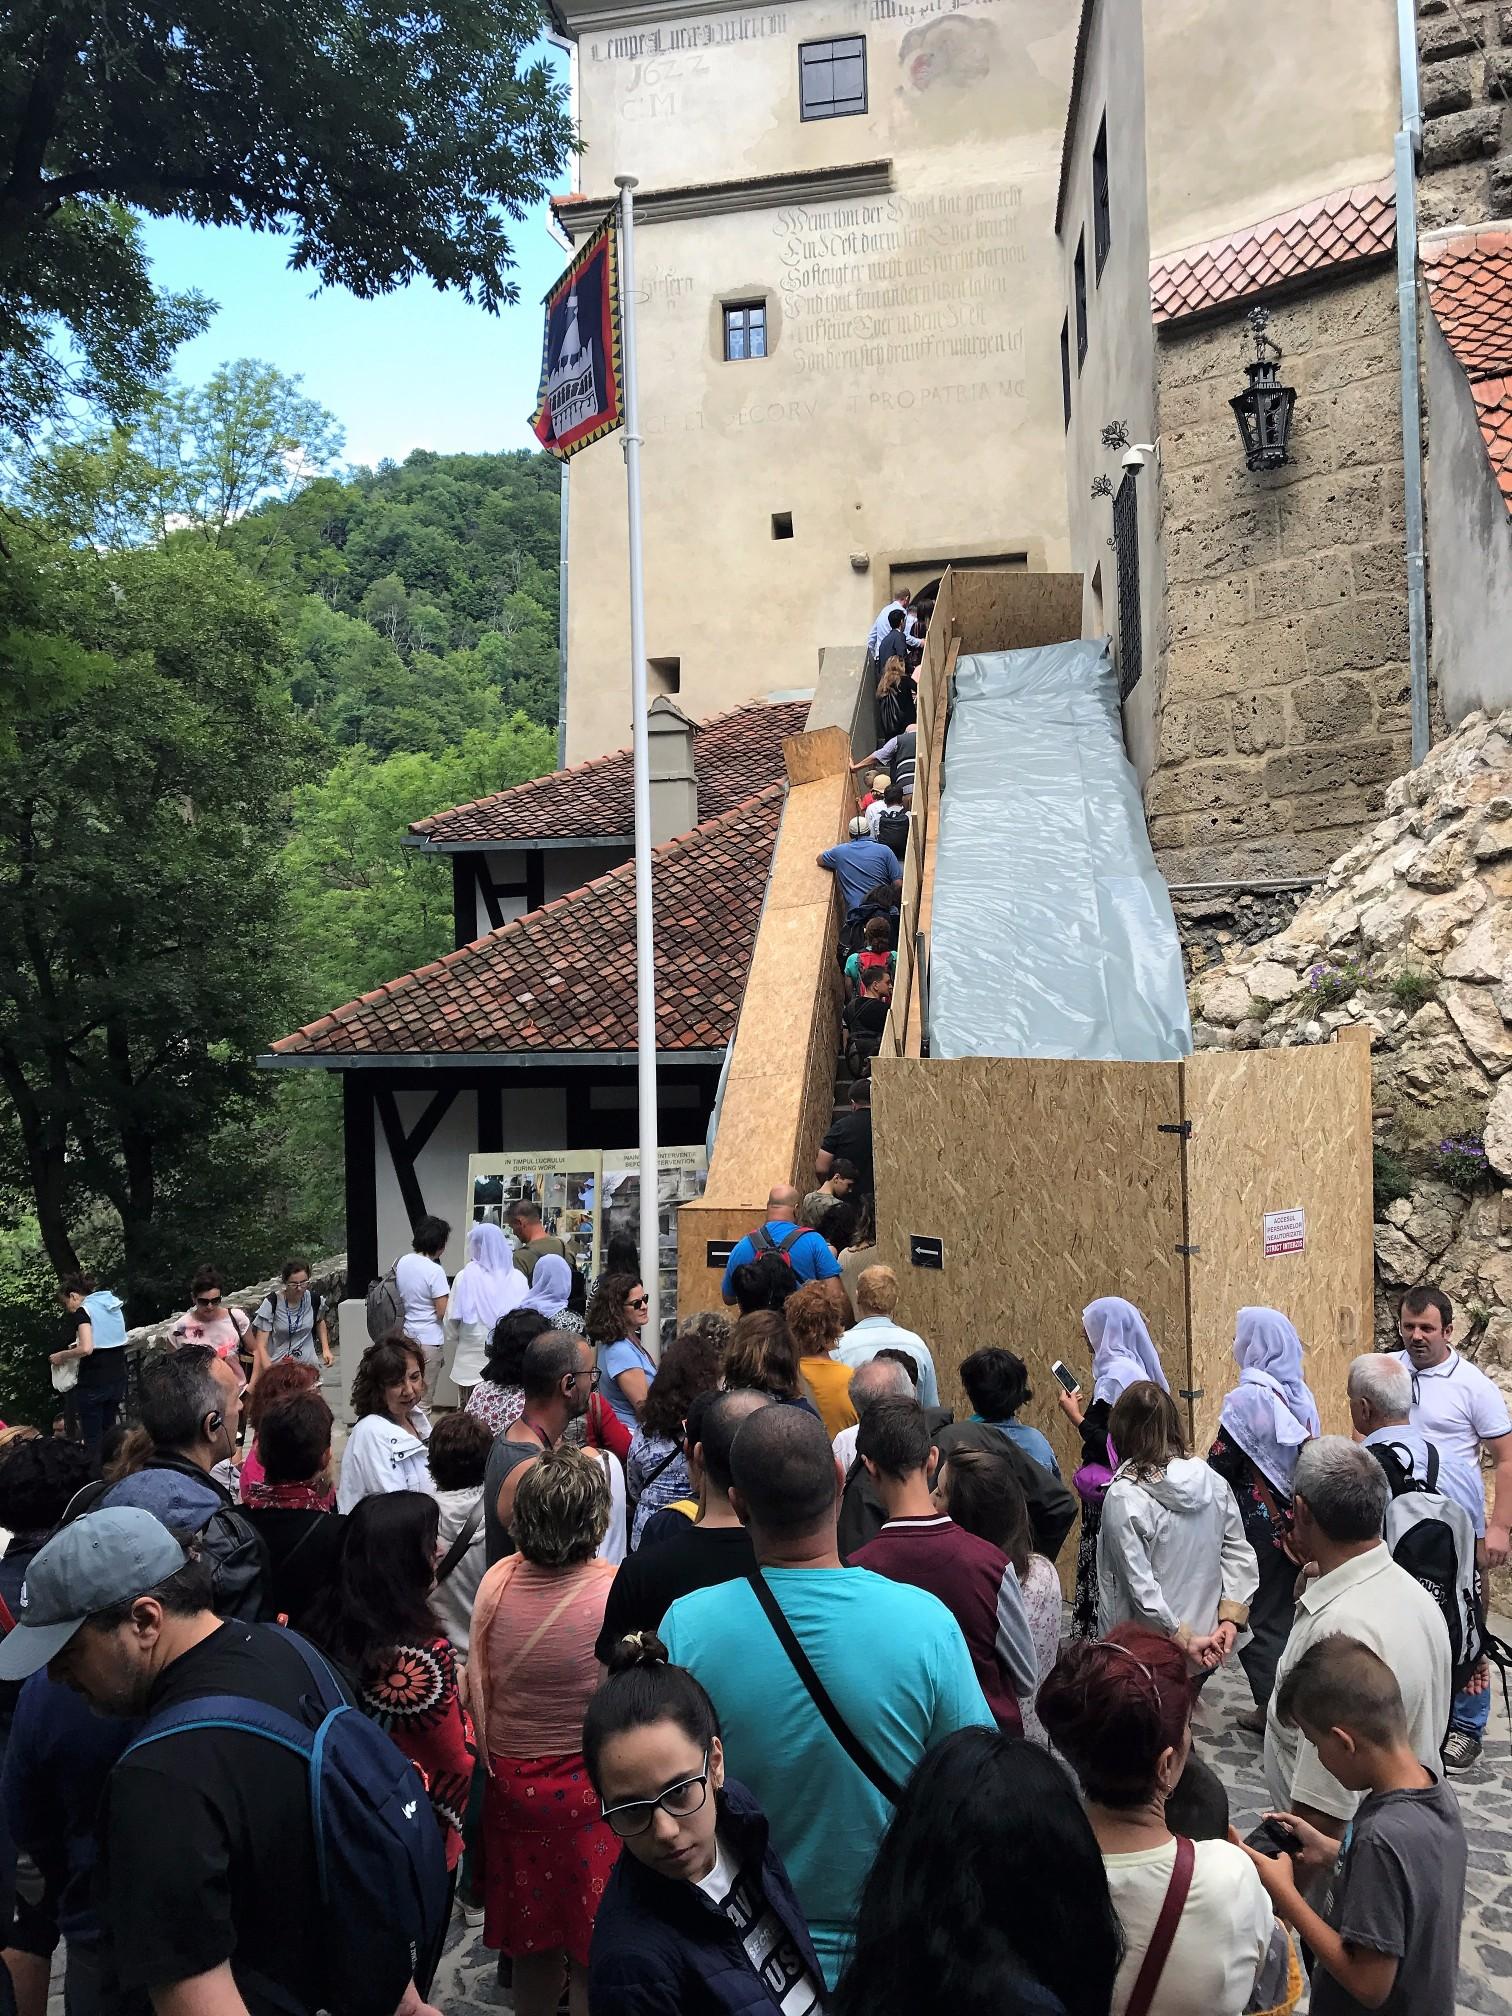 Massive crowds descending on the castle